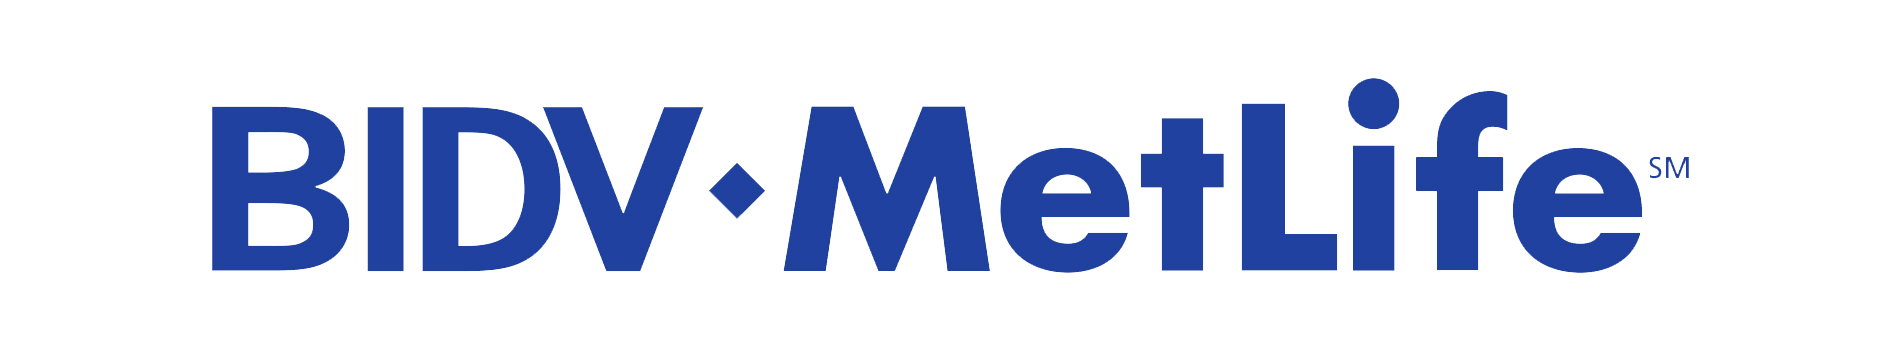 Công ty BIDV Metlife